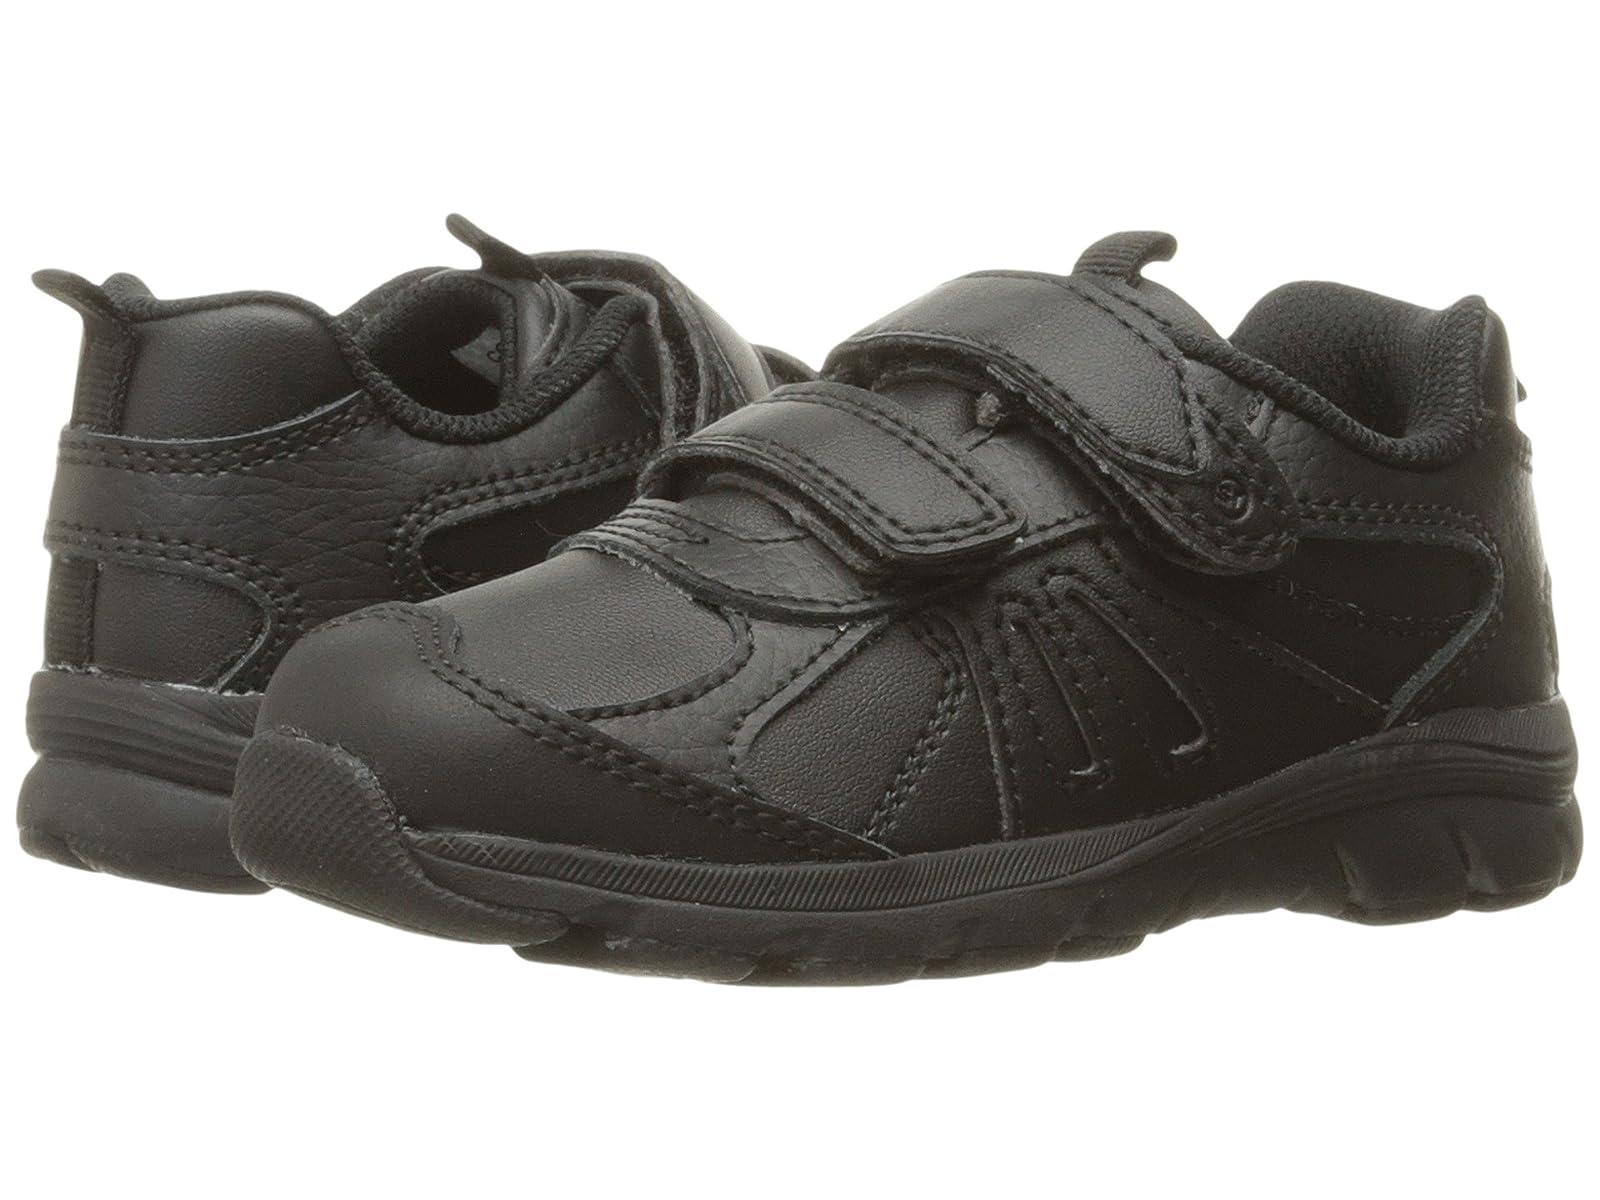 Stride Rite Cooper 2.0 H&L (Toddler)Atmospheric grades have affordable shoes